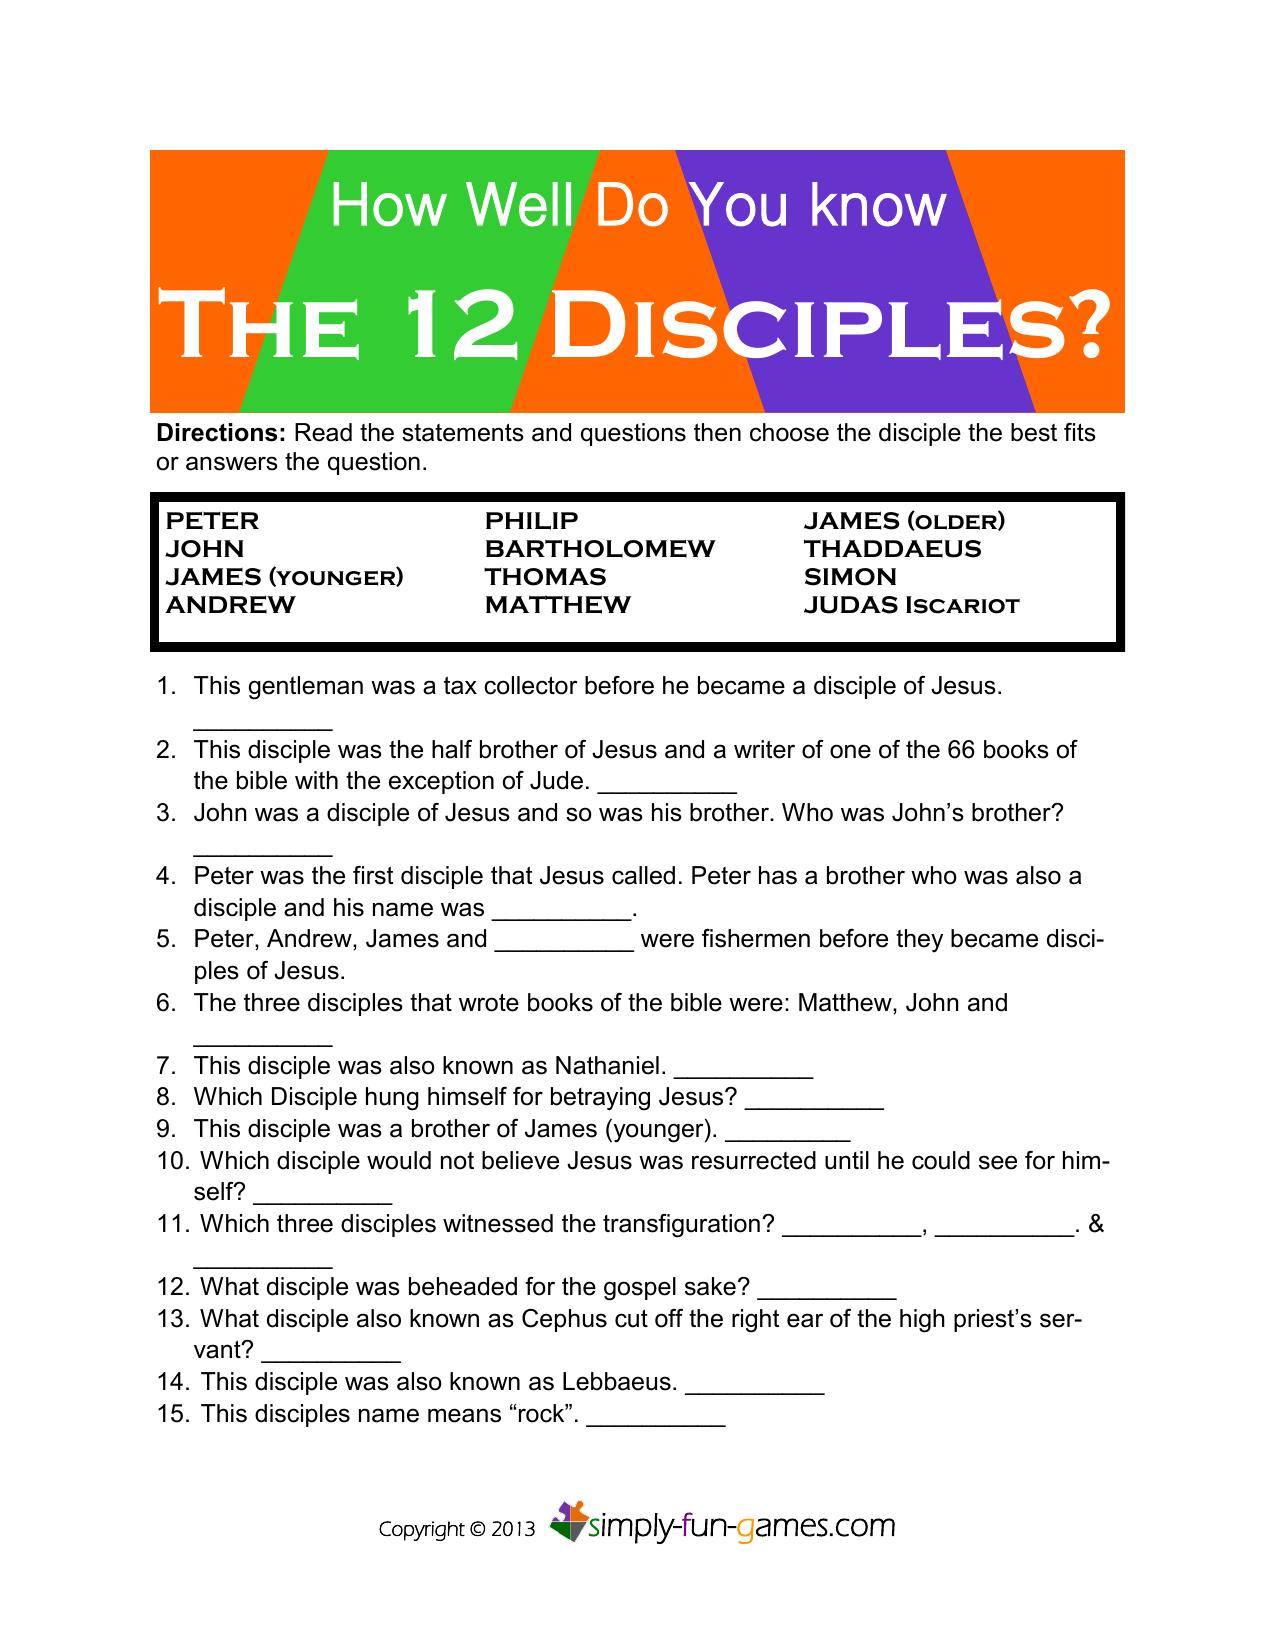 The 12 Disciples Simply Fun Games